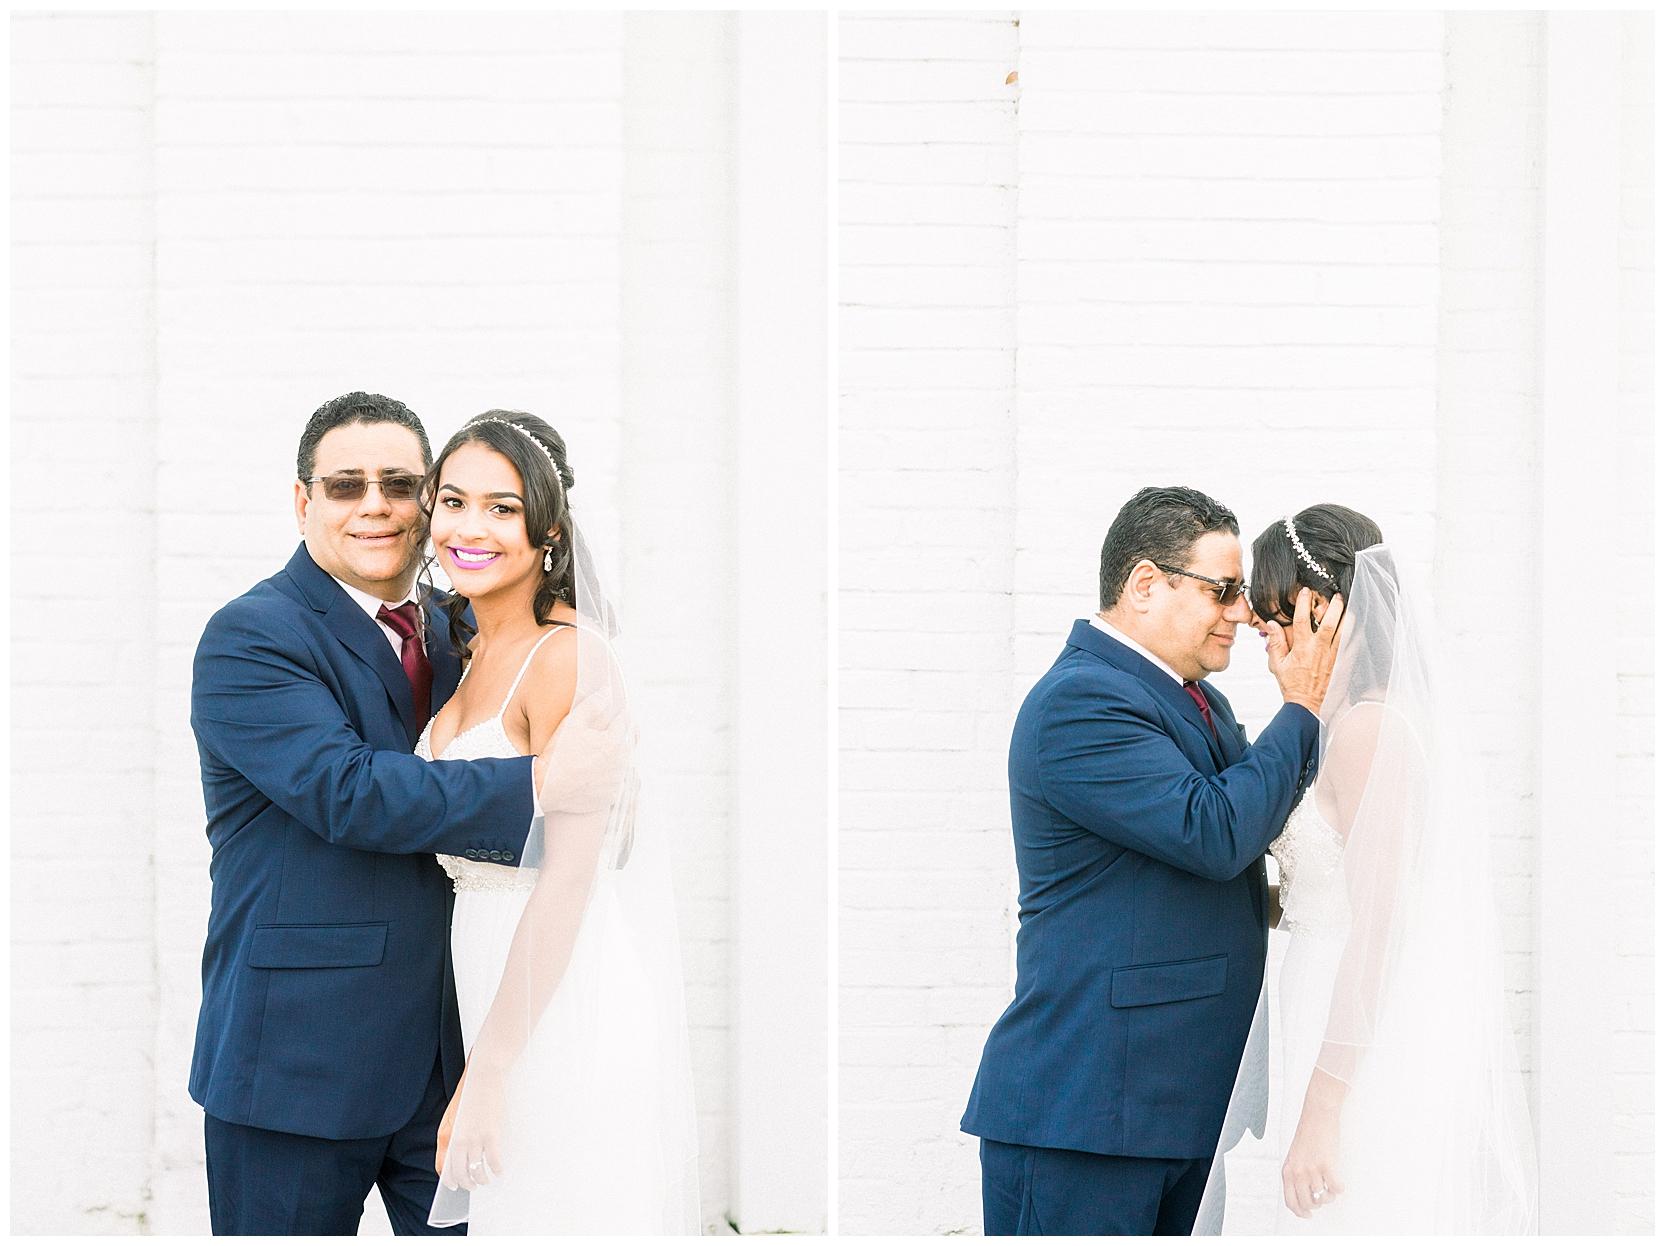 jessicafredericks_lakeland_tampa_wedding_purple_crazy hour_0038.jpg